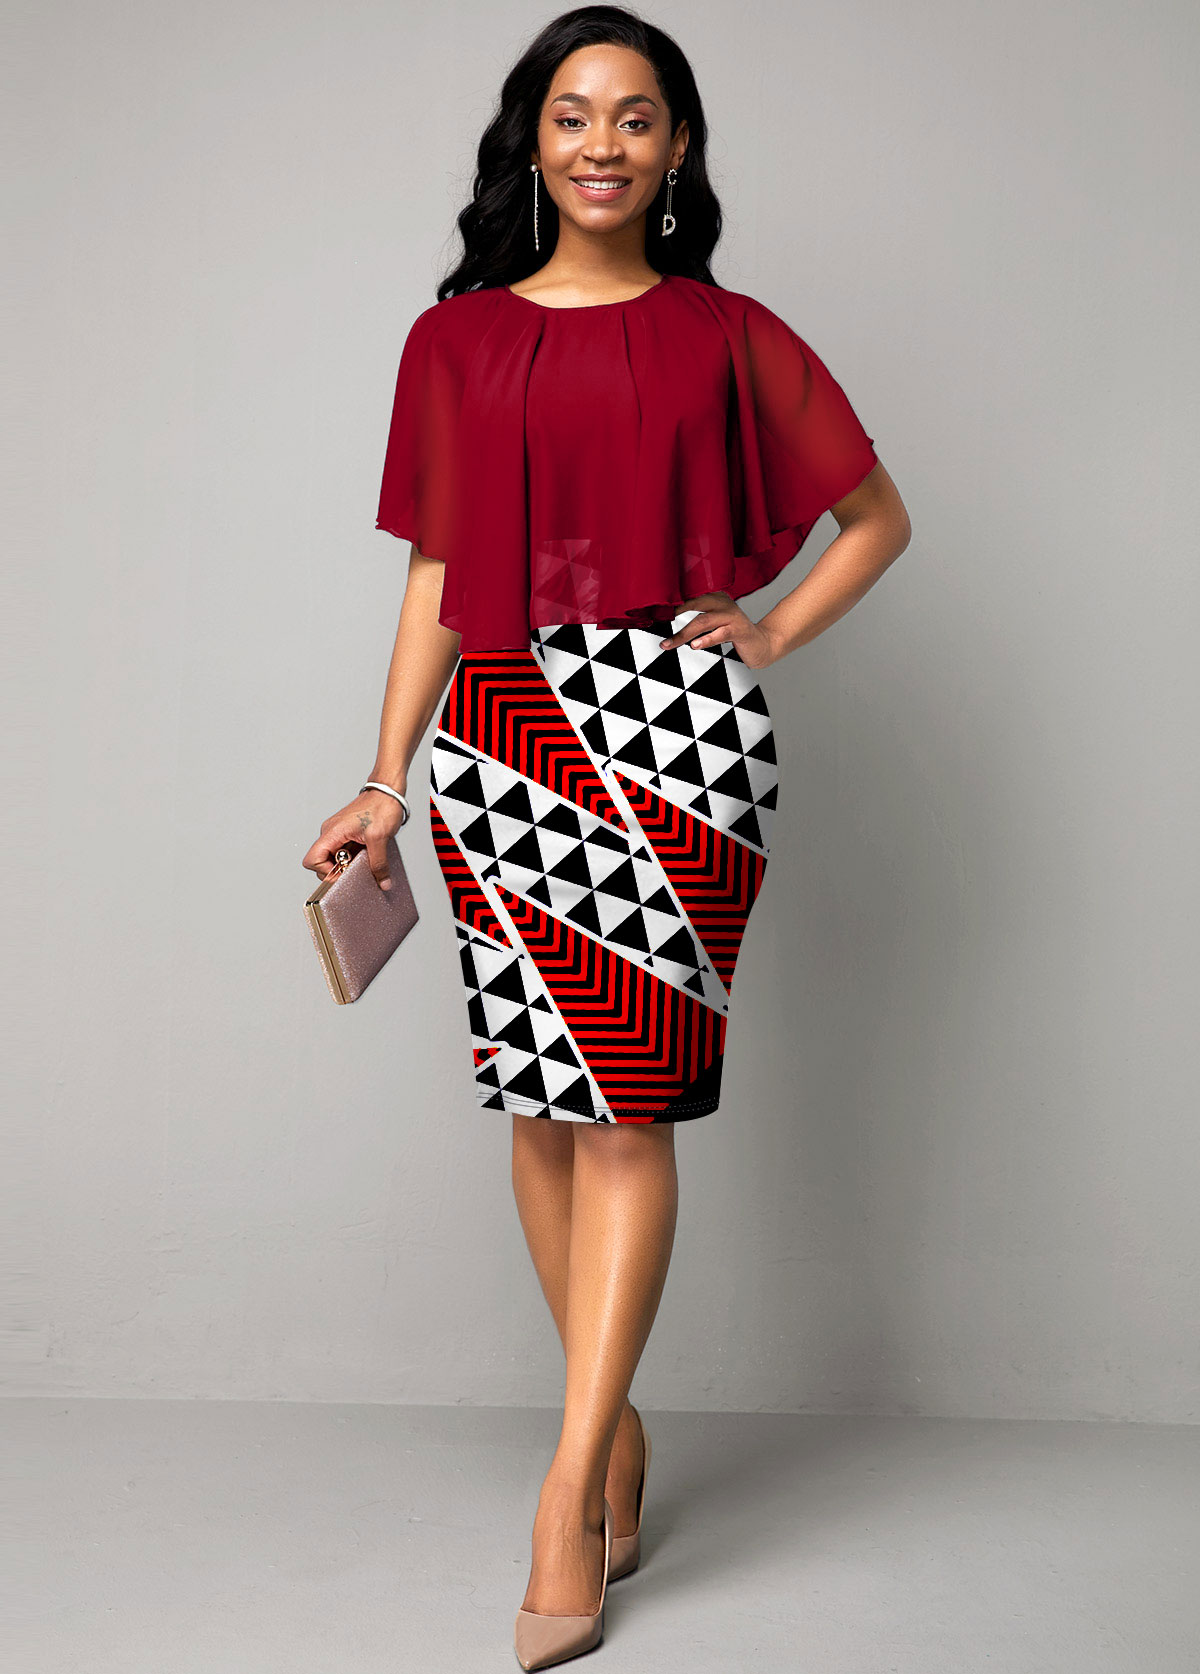 ROTITA Chiffon Overlay Round Neck Geometric Print Dress